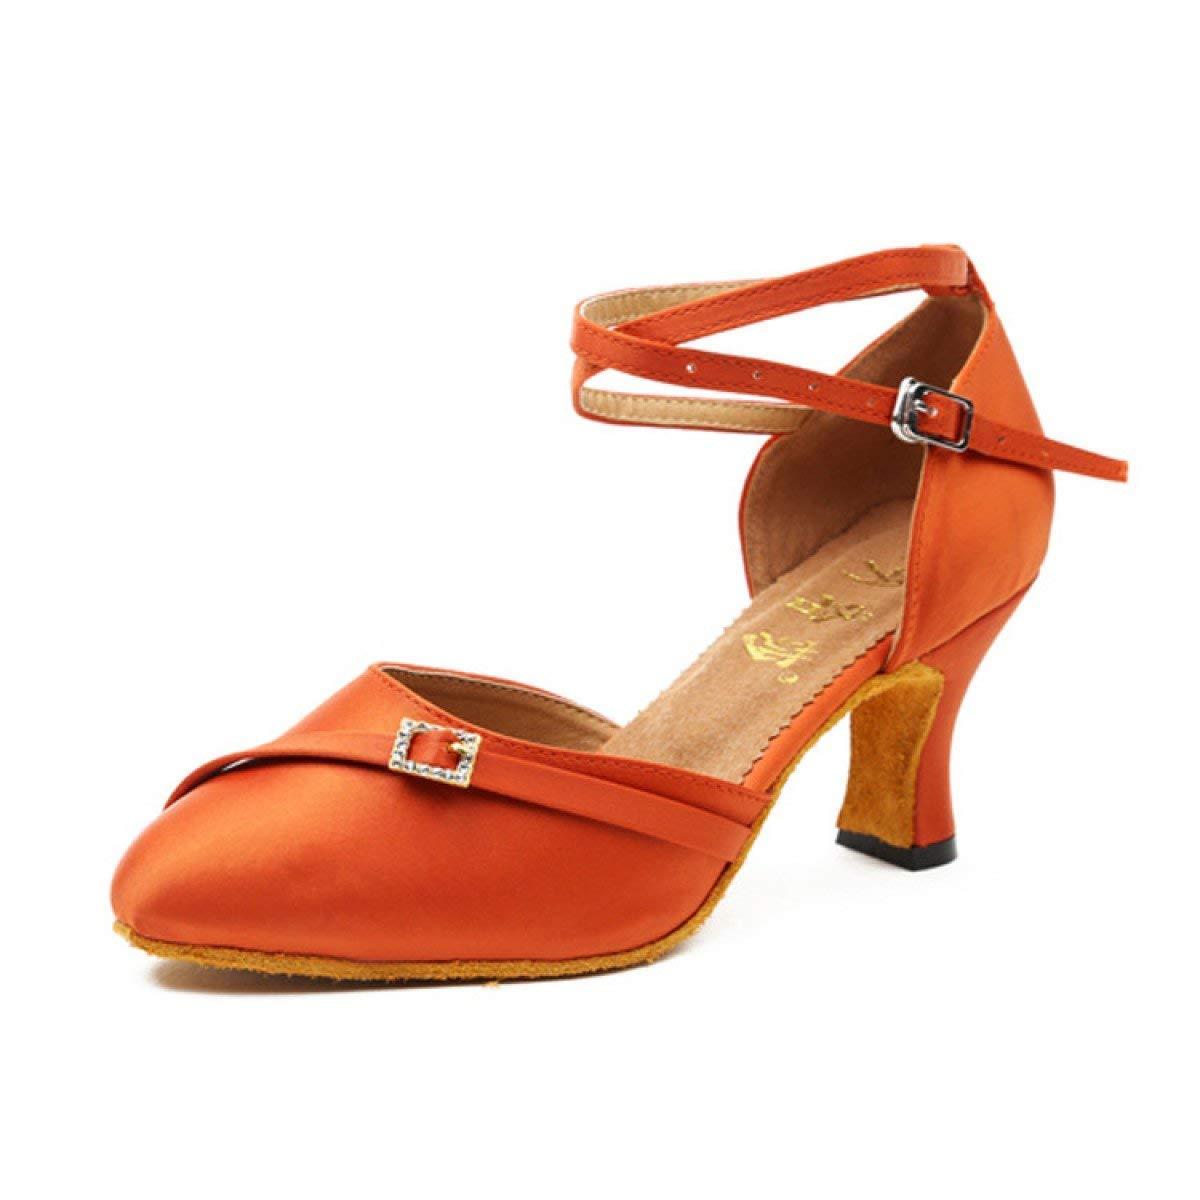 Willsego damen Latin Dance Closed Toe Hoher AbsatzSalsa Tango Chacha Samba Modern Jazz Schuhe Sandalen Orangeheeled6cm-UK4.5   EU36   Our37 (Farbe   Orangeheeled5cm Größe   UK3 EU33 Our34)